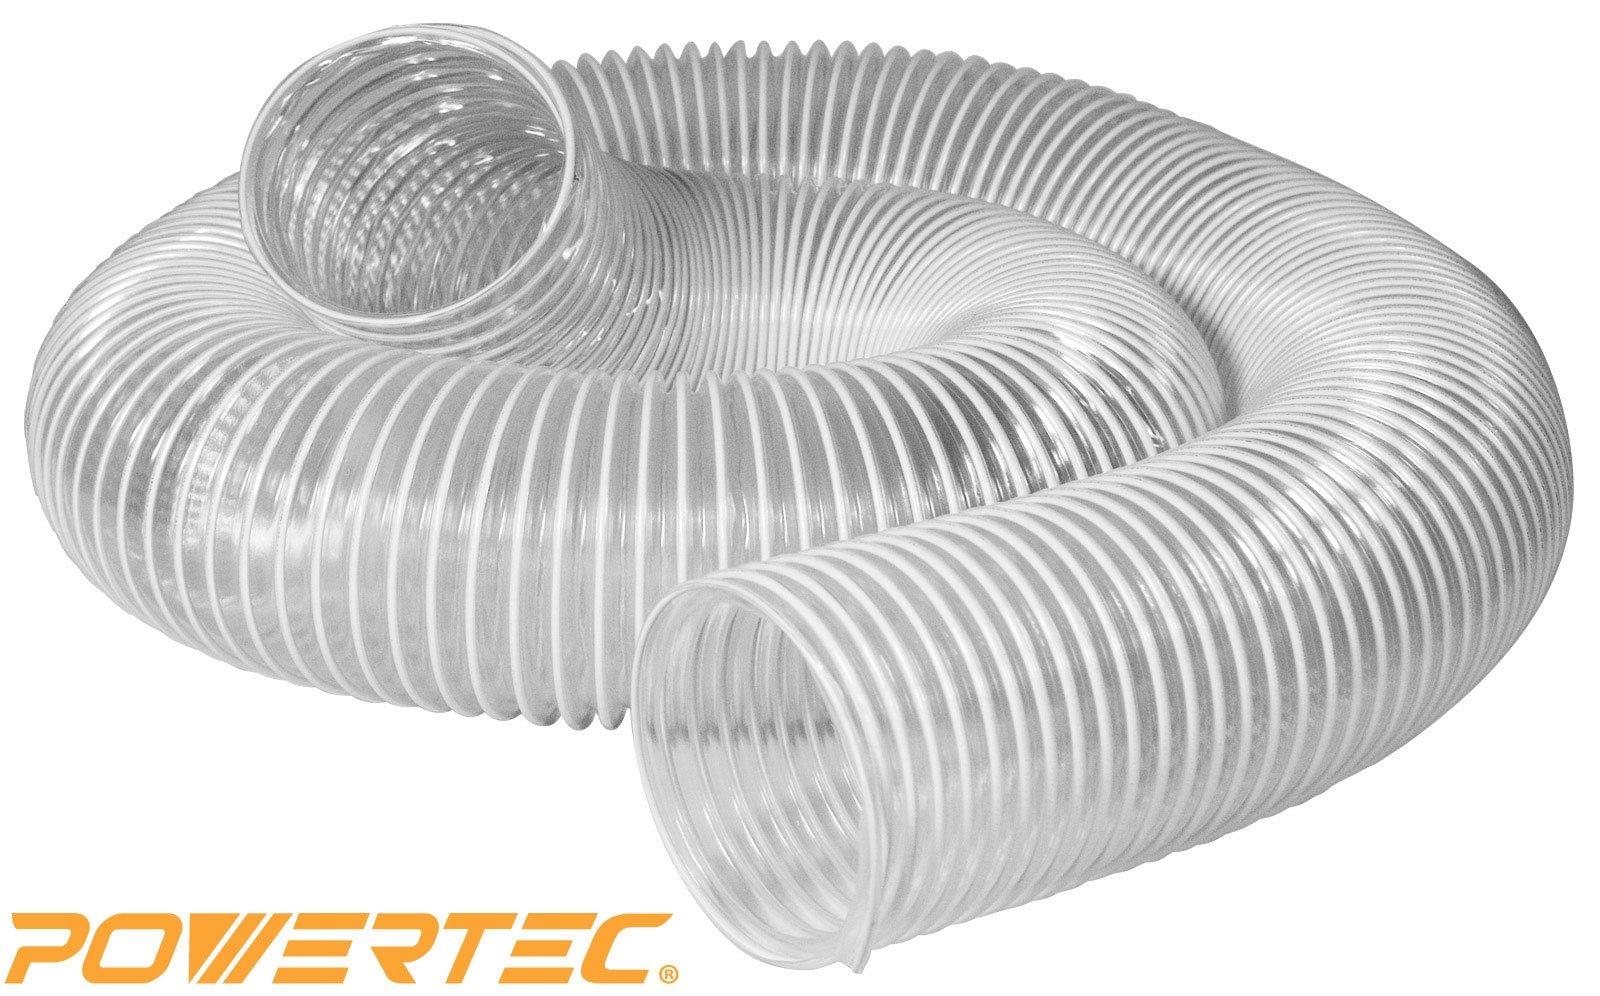 POWERTEC 70111 Heavy Duty 4-Inch x 10-Foot PVC Flexible Dust Collection Hose, Clear Color